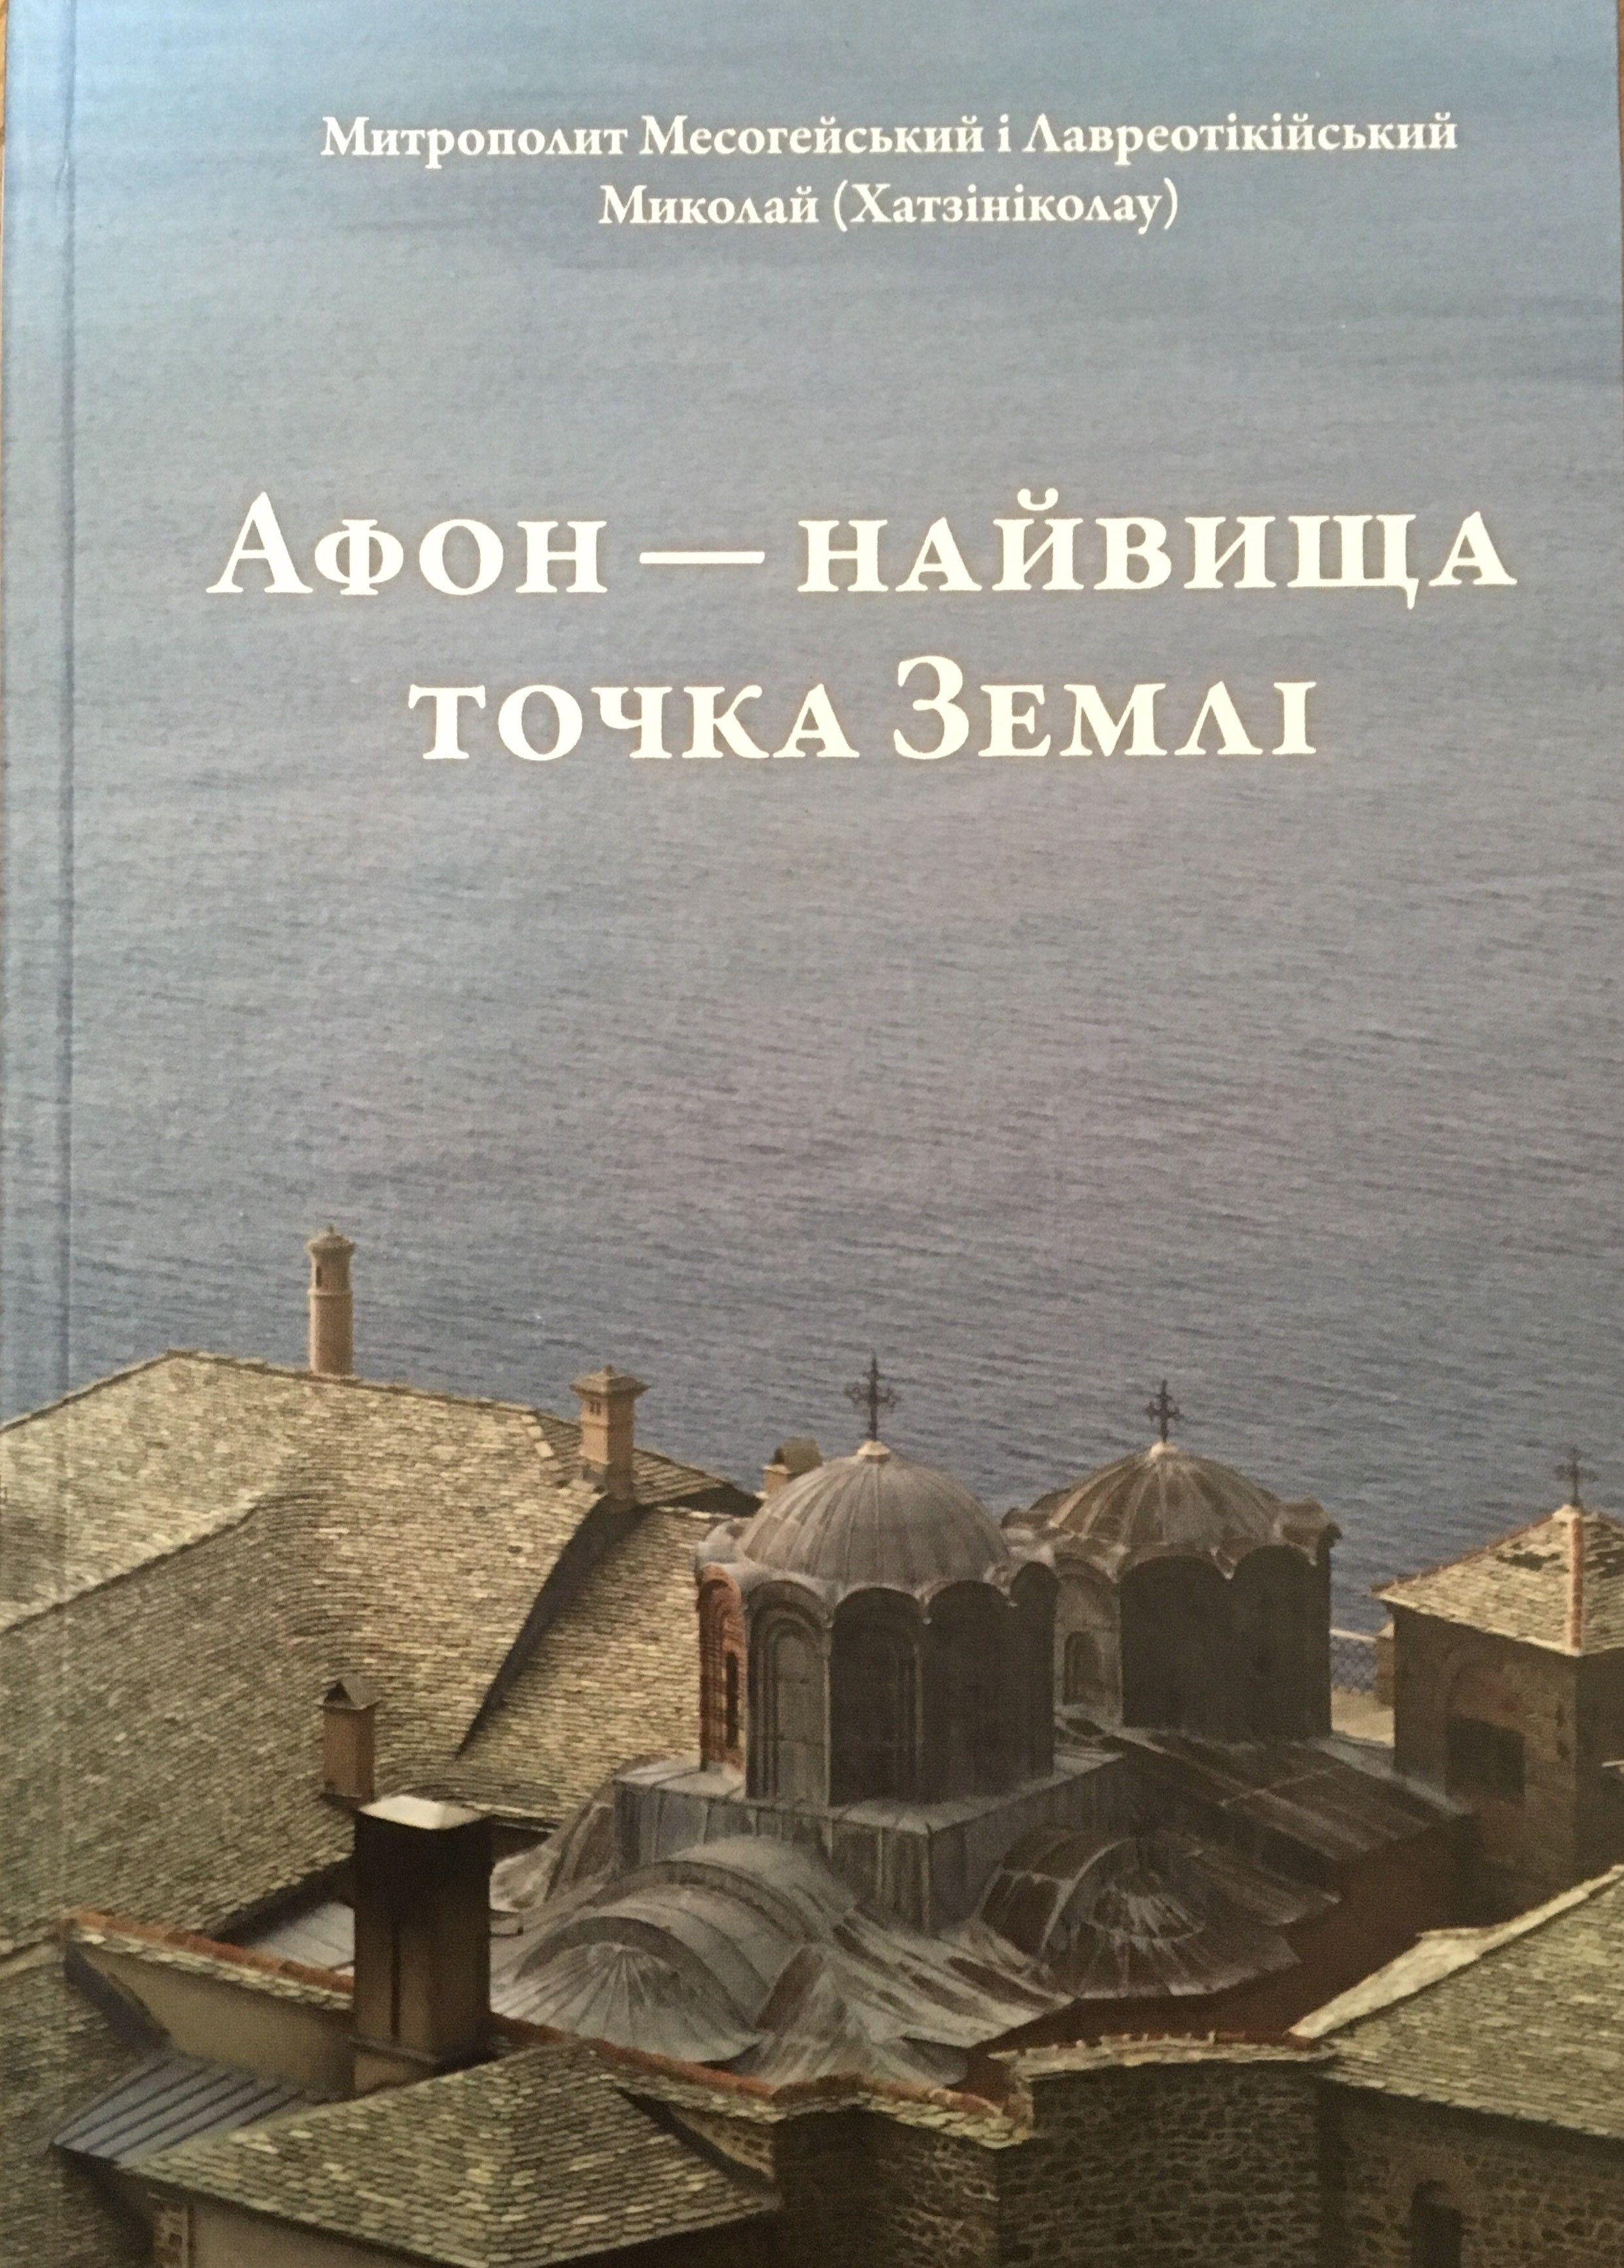 Фото: athos-ukraine.com